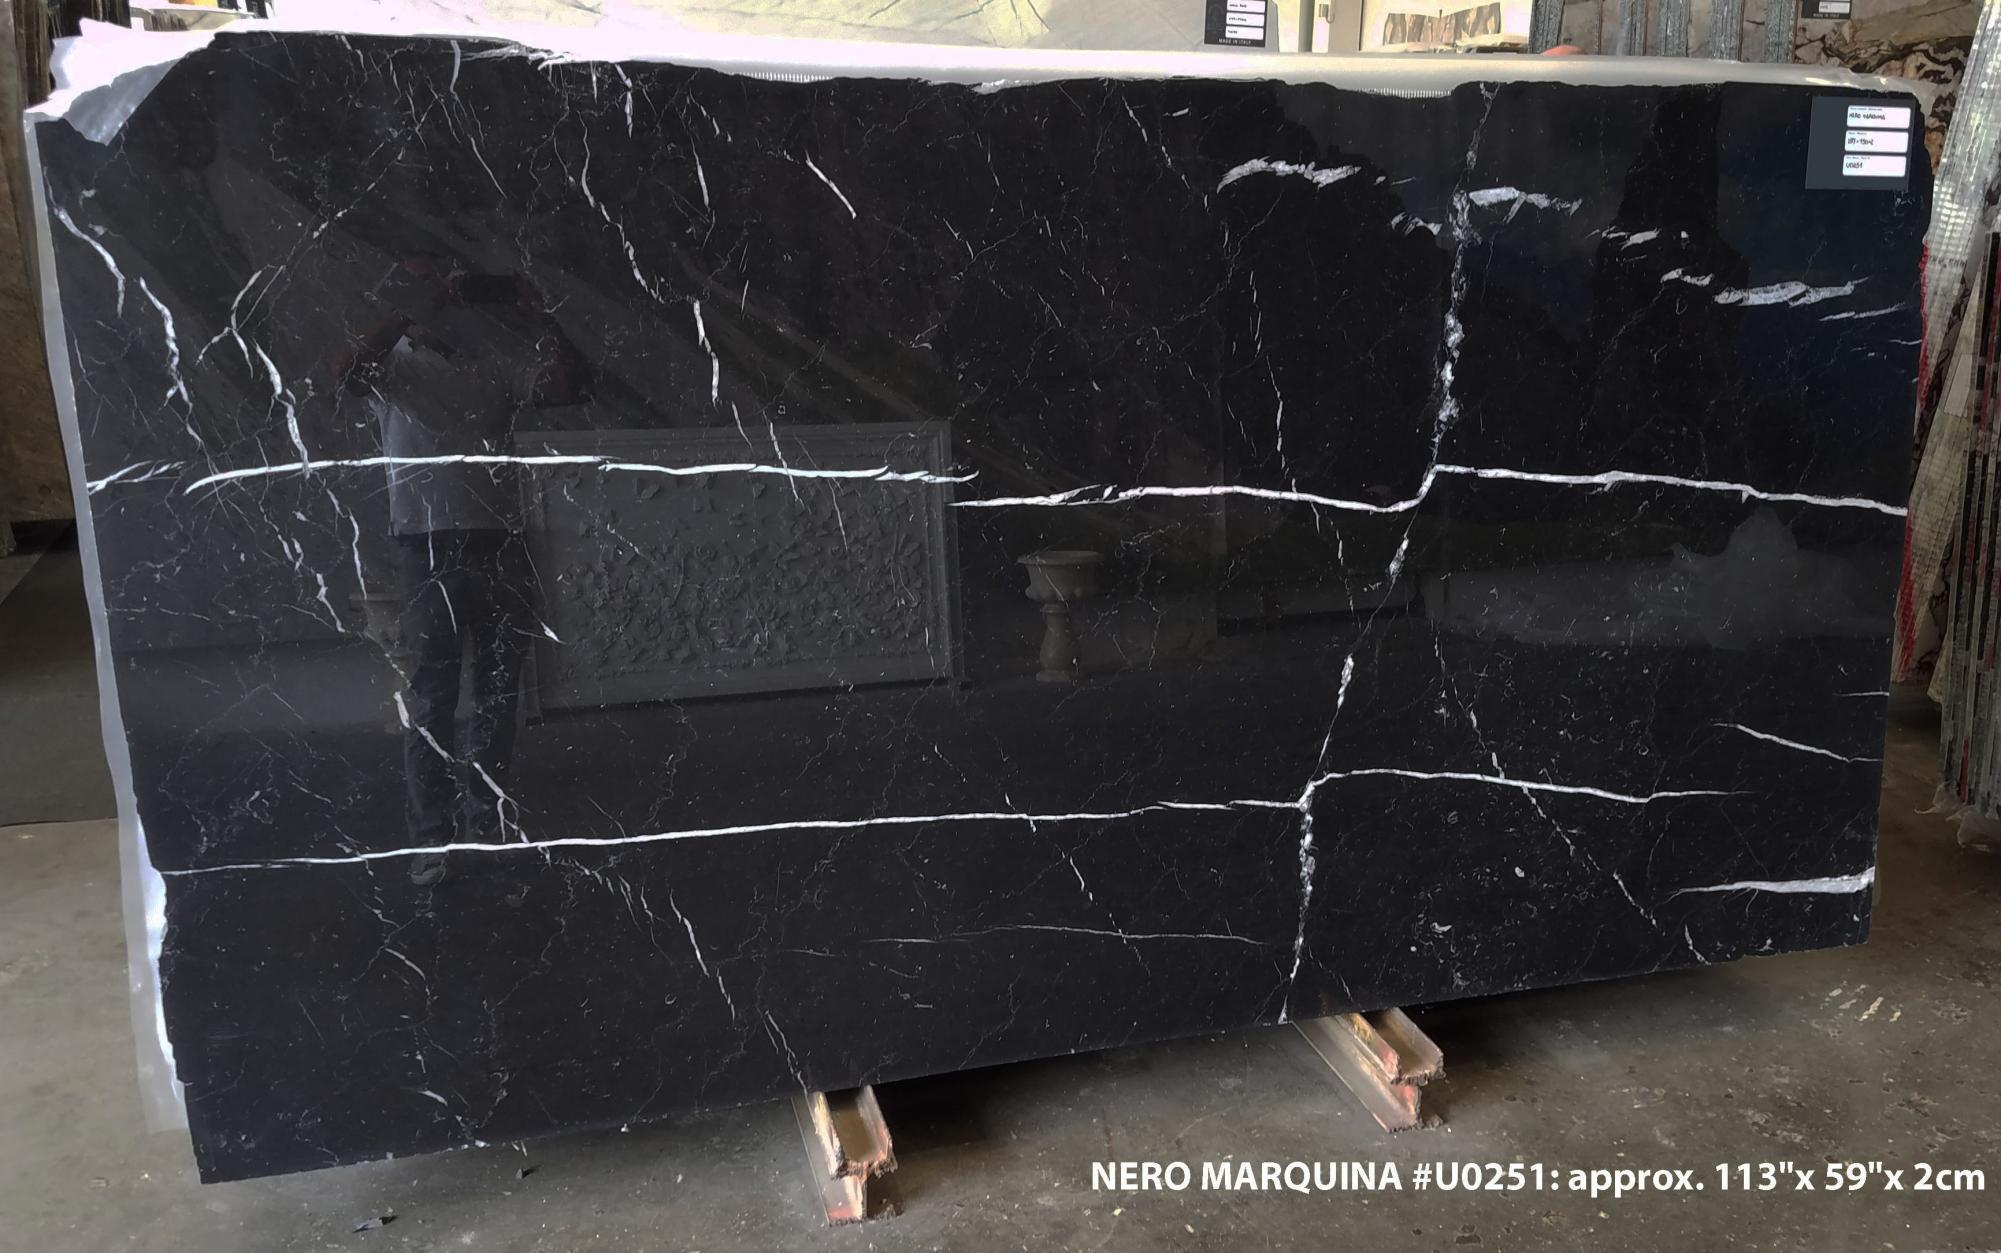 NERO MARQUINA Fourniture (Italie) d' dalles brillantes en marbre naturel U0251 , SL2CM